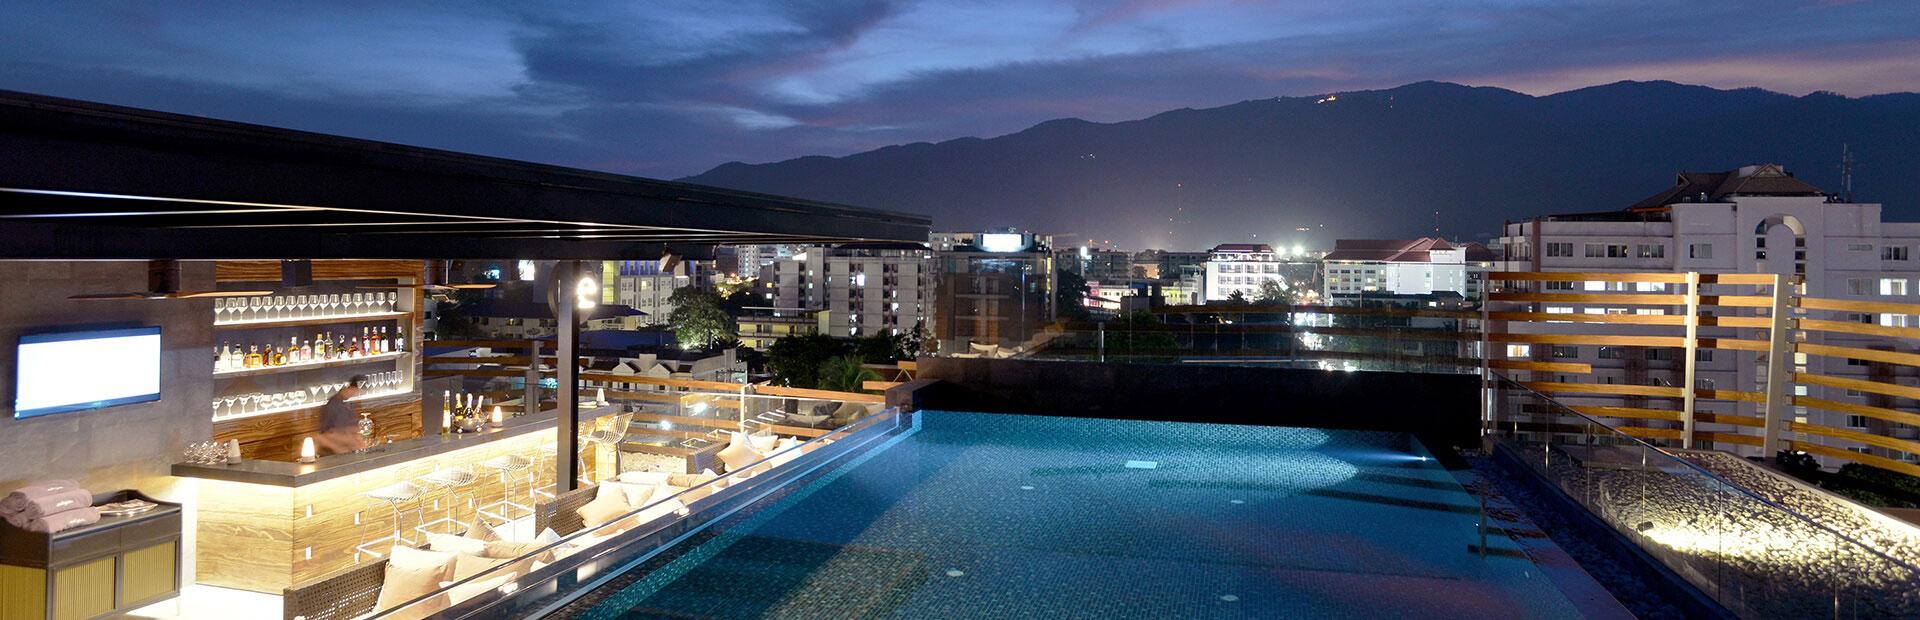 Hotel Chiang Mai Piscine